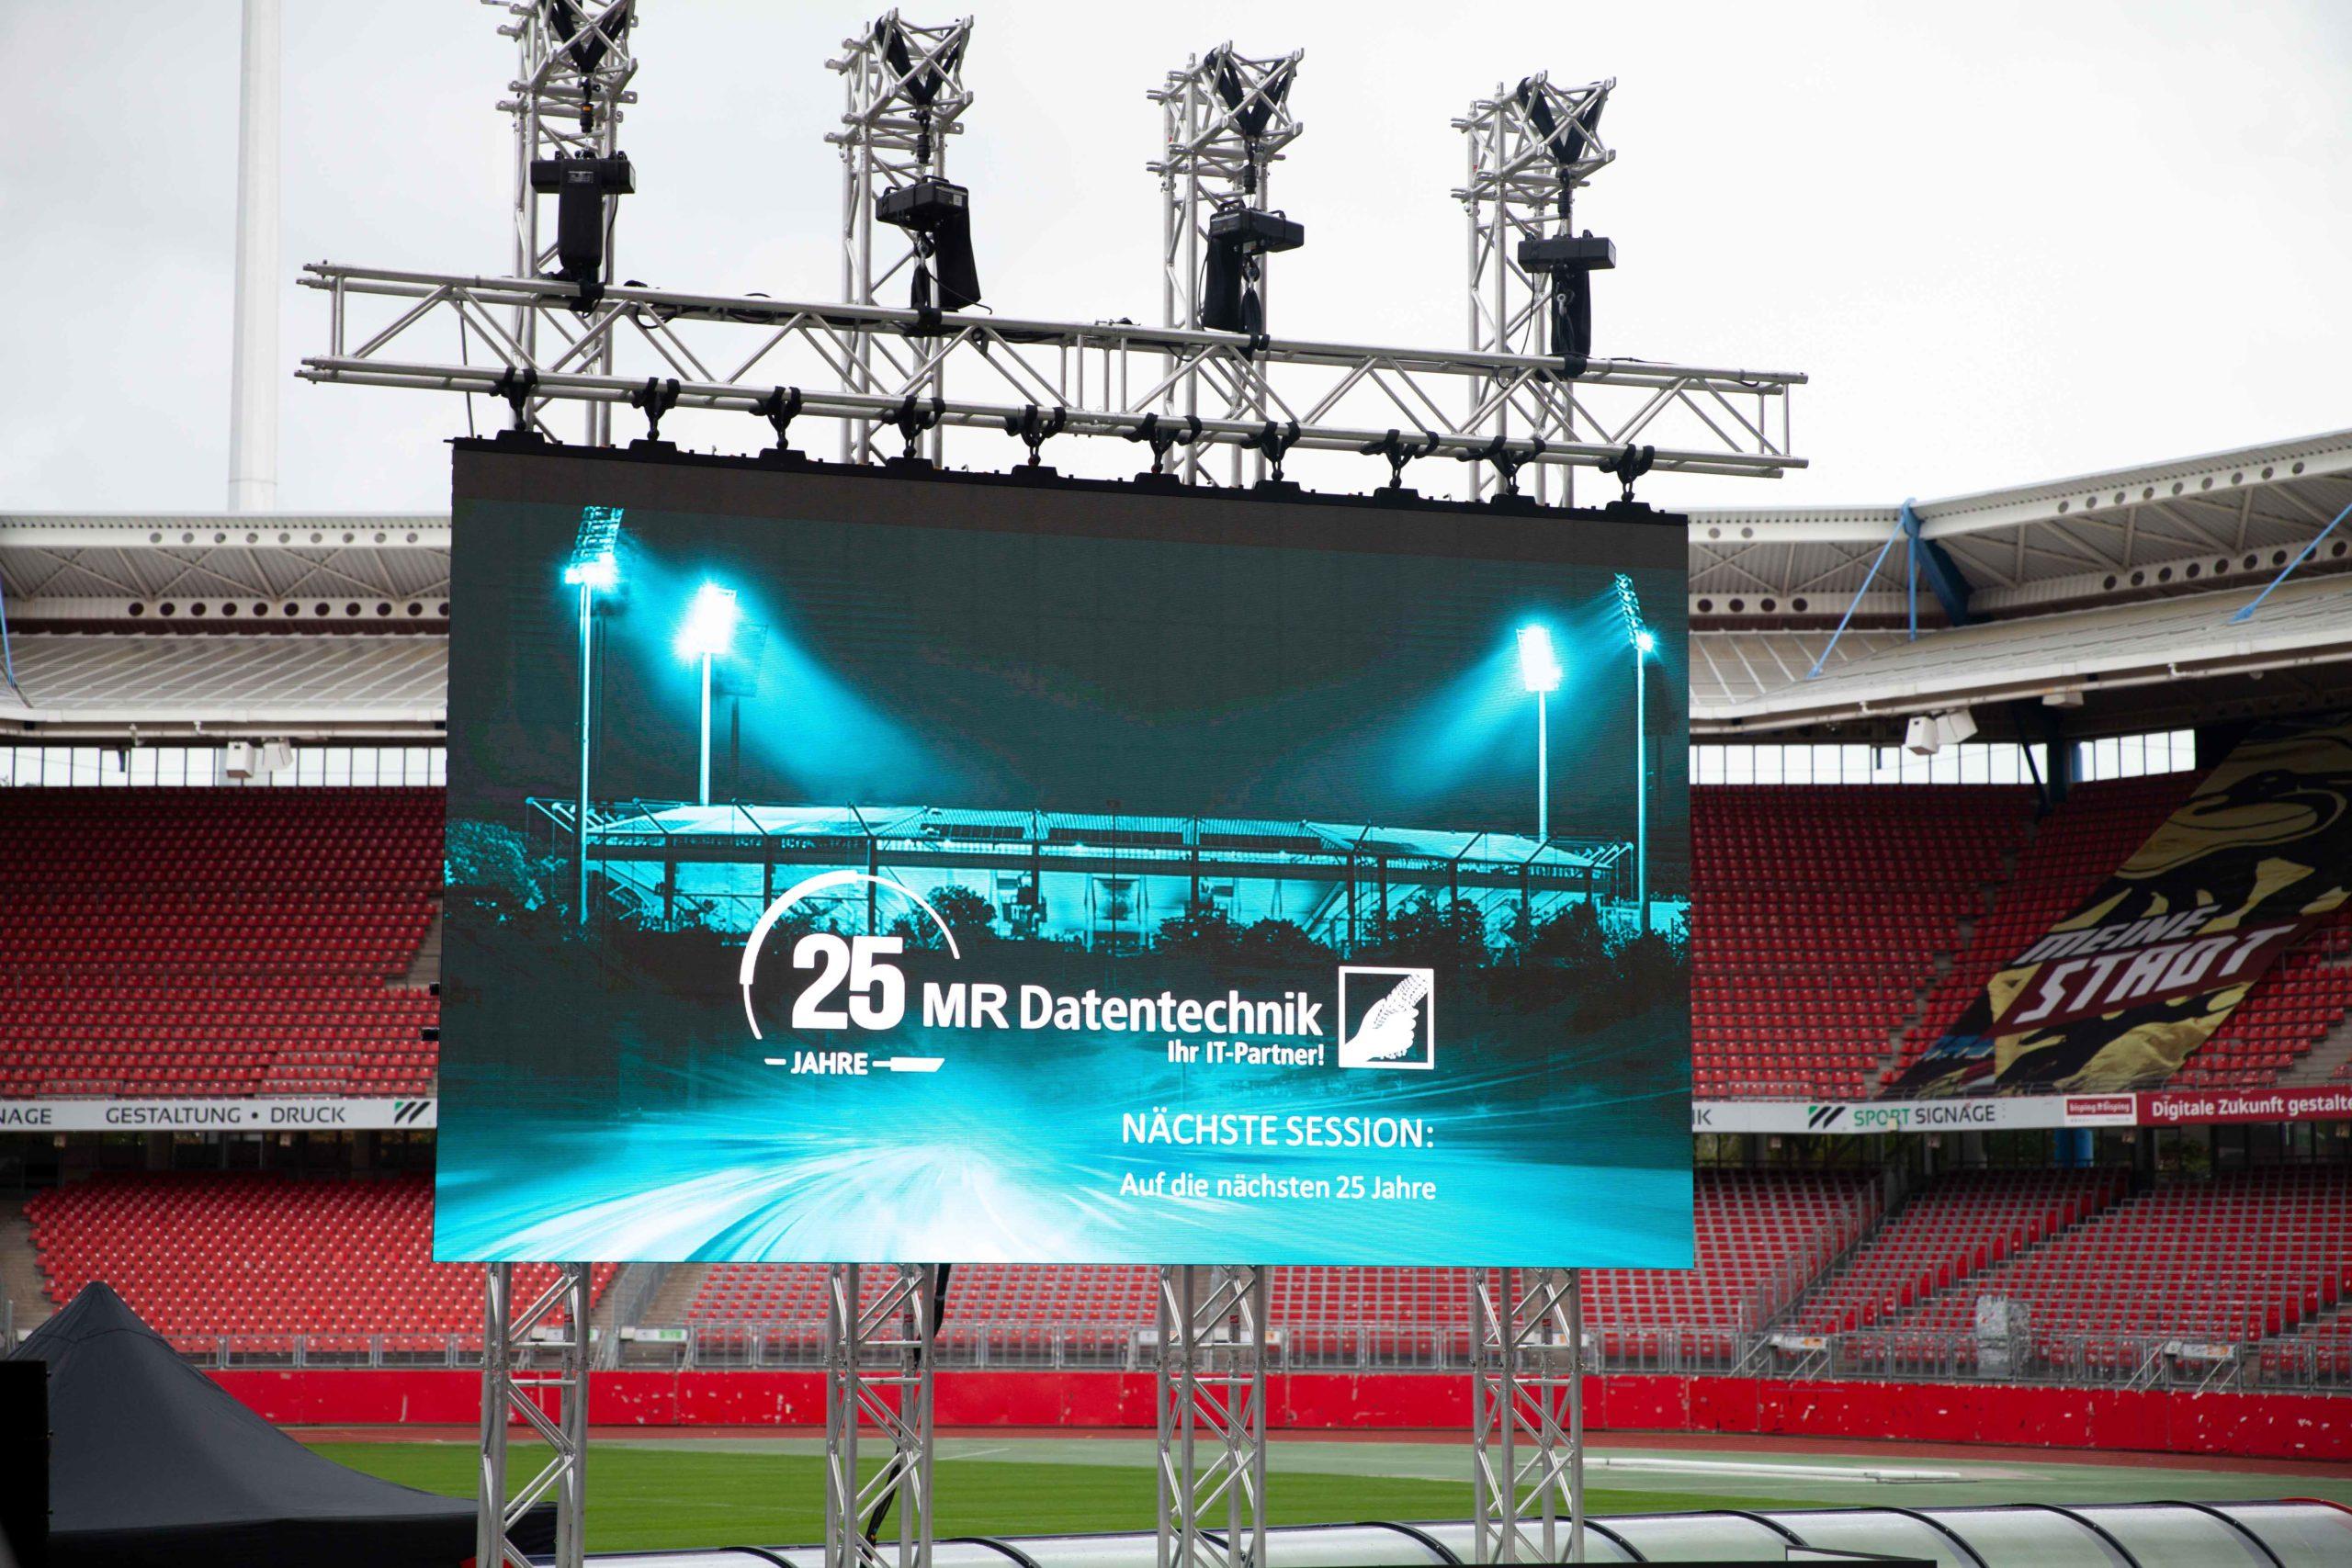 25 Jahre MR Hausmesse im Max-Morlock-Stadion